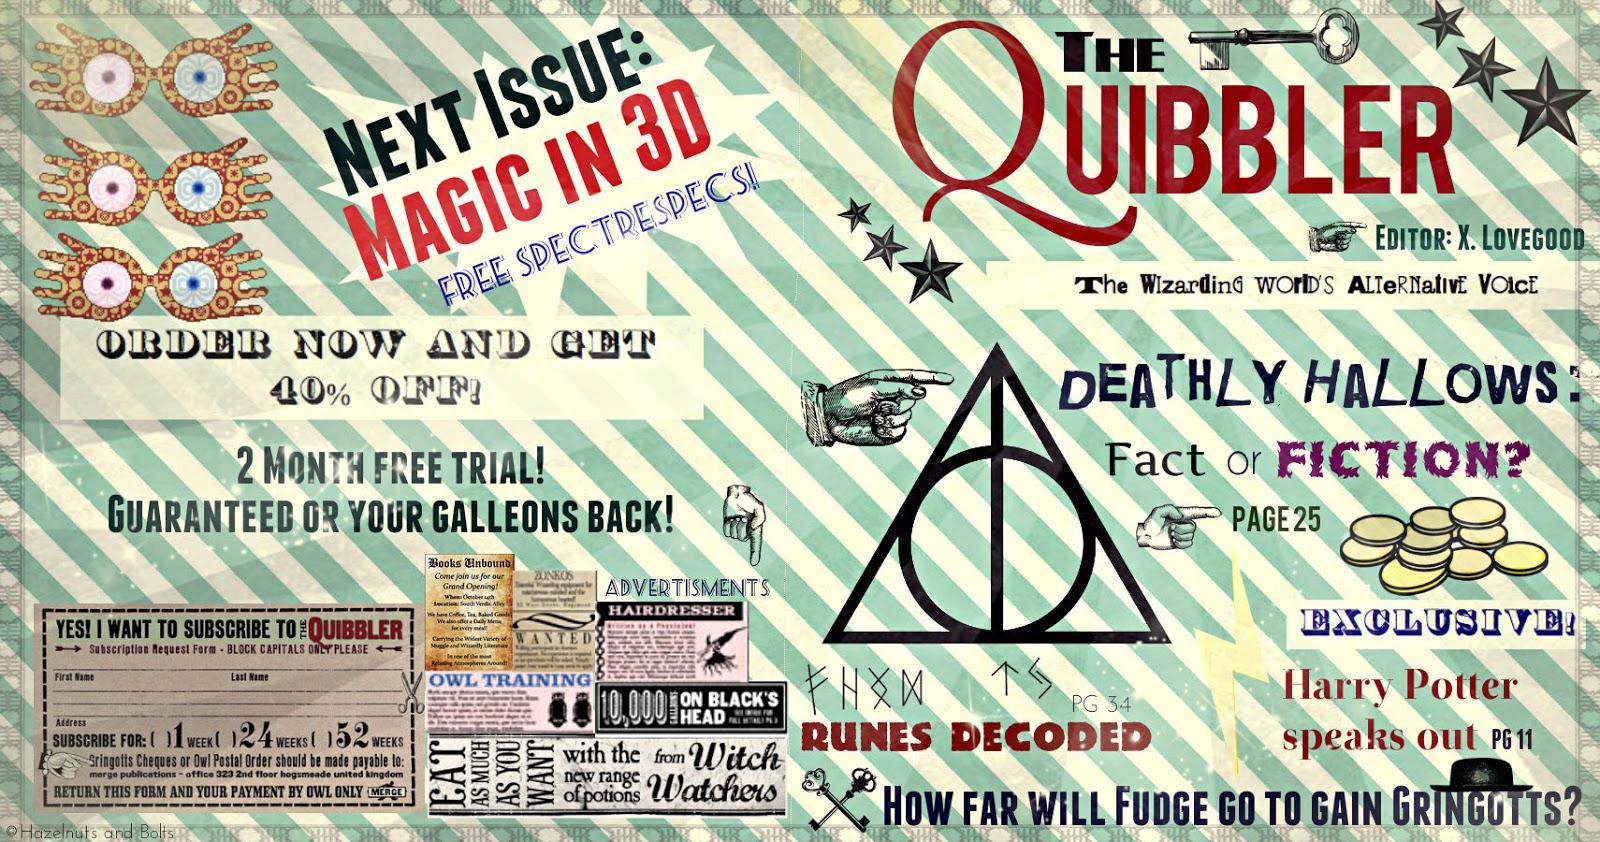 Quibbler Cover Lunar Rainbows Reviews...